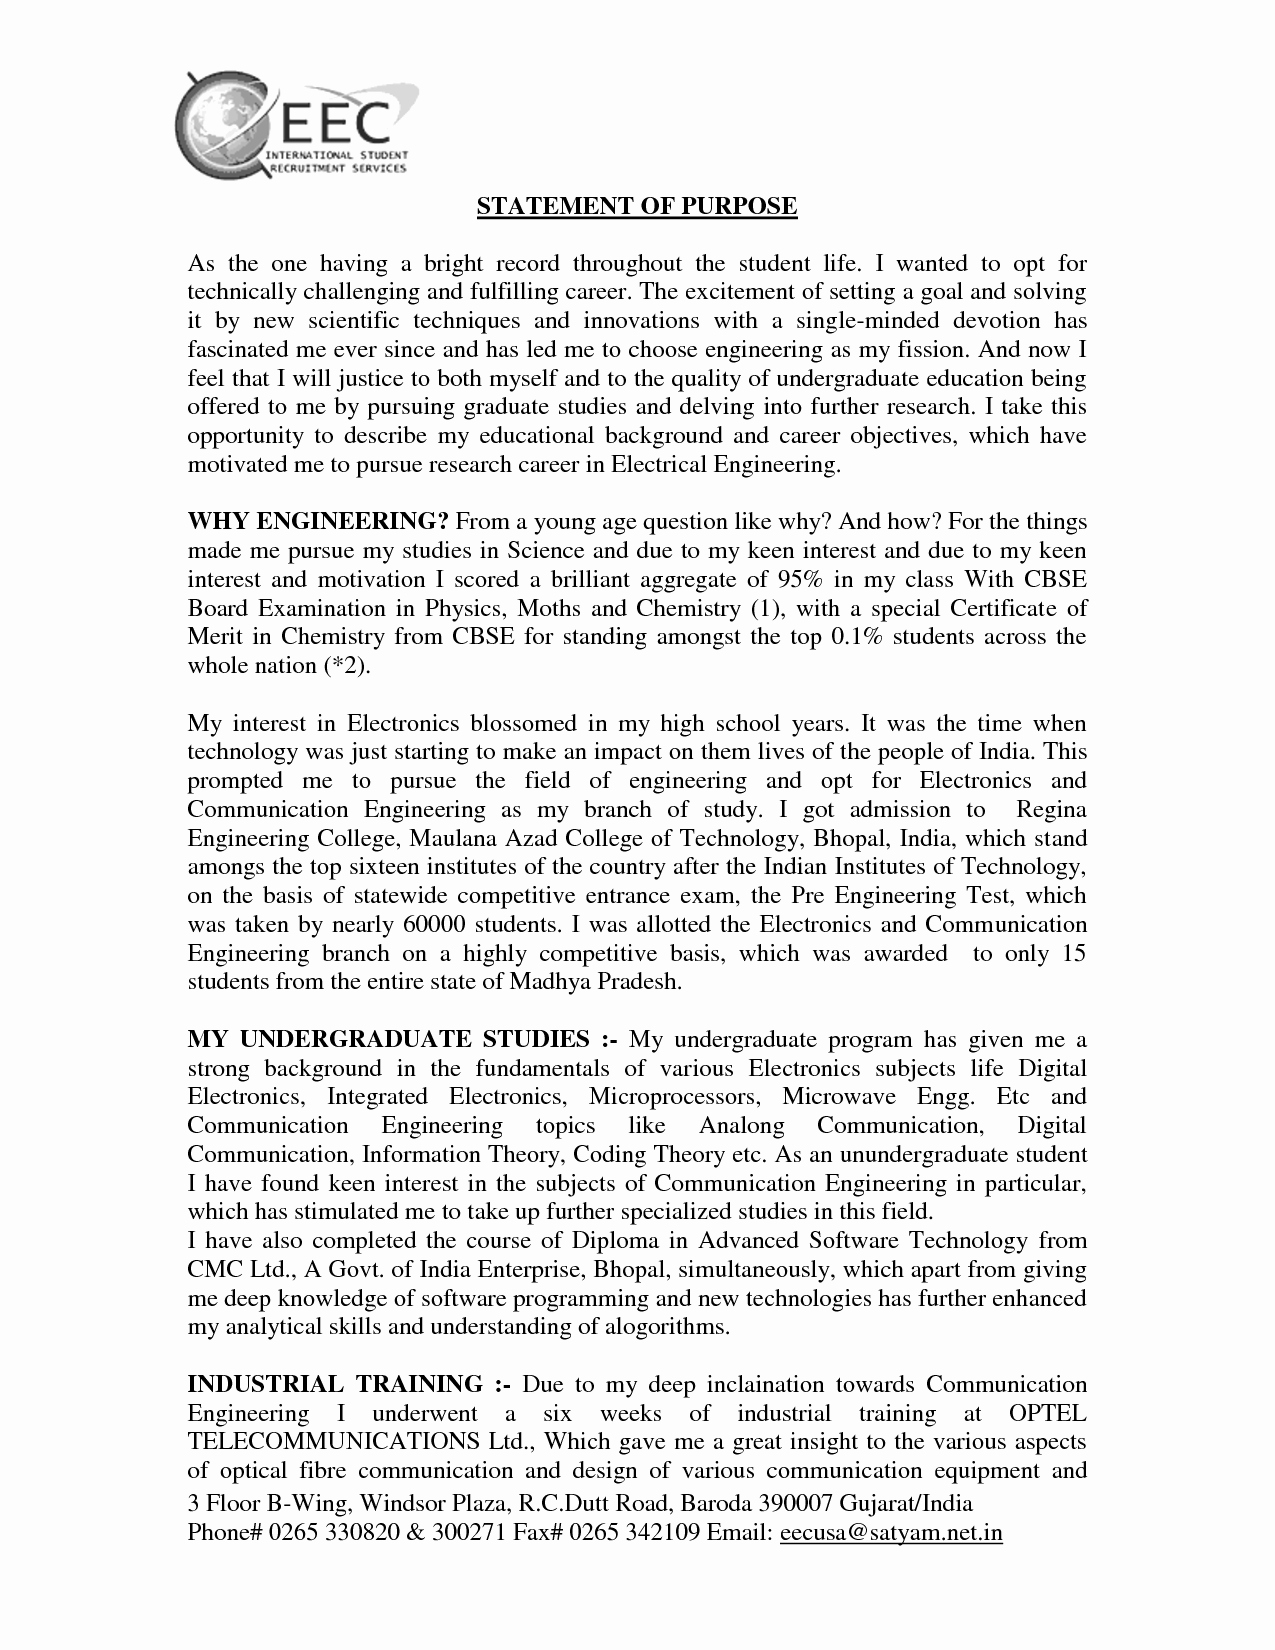 Statement Of Purpose Sample Computer Science Inspirational Related Statement Purpose Graduate School